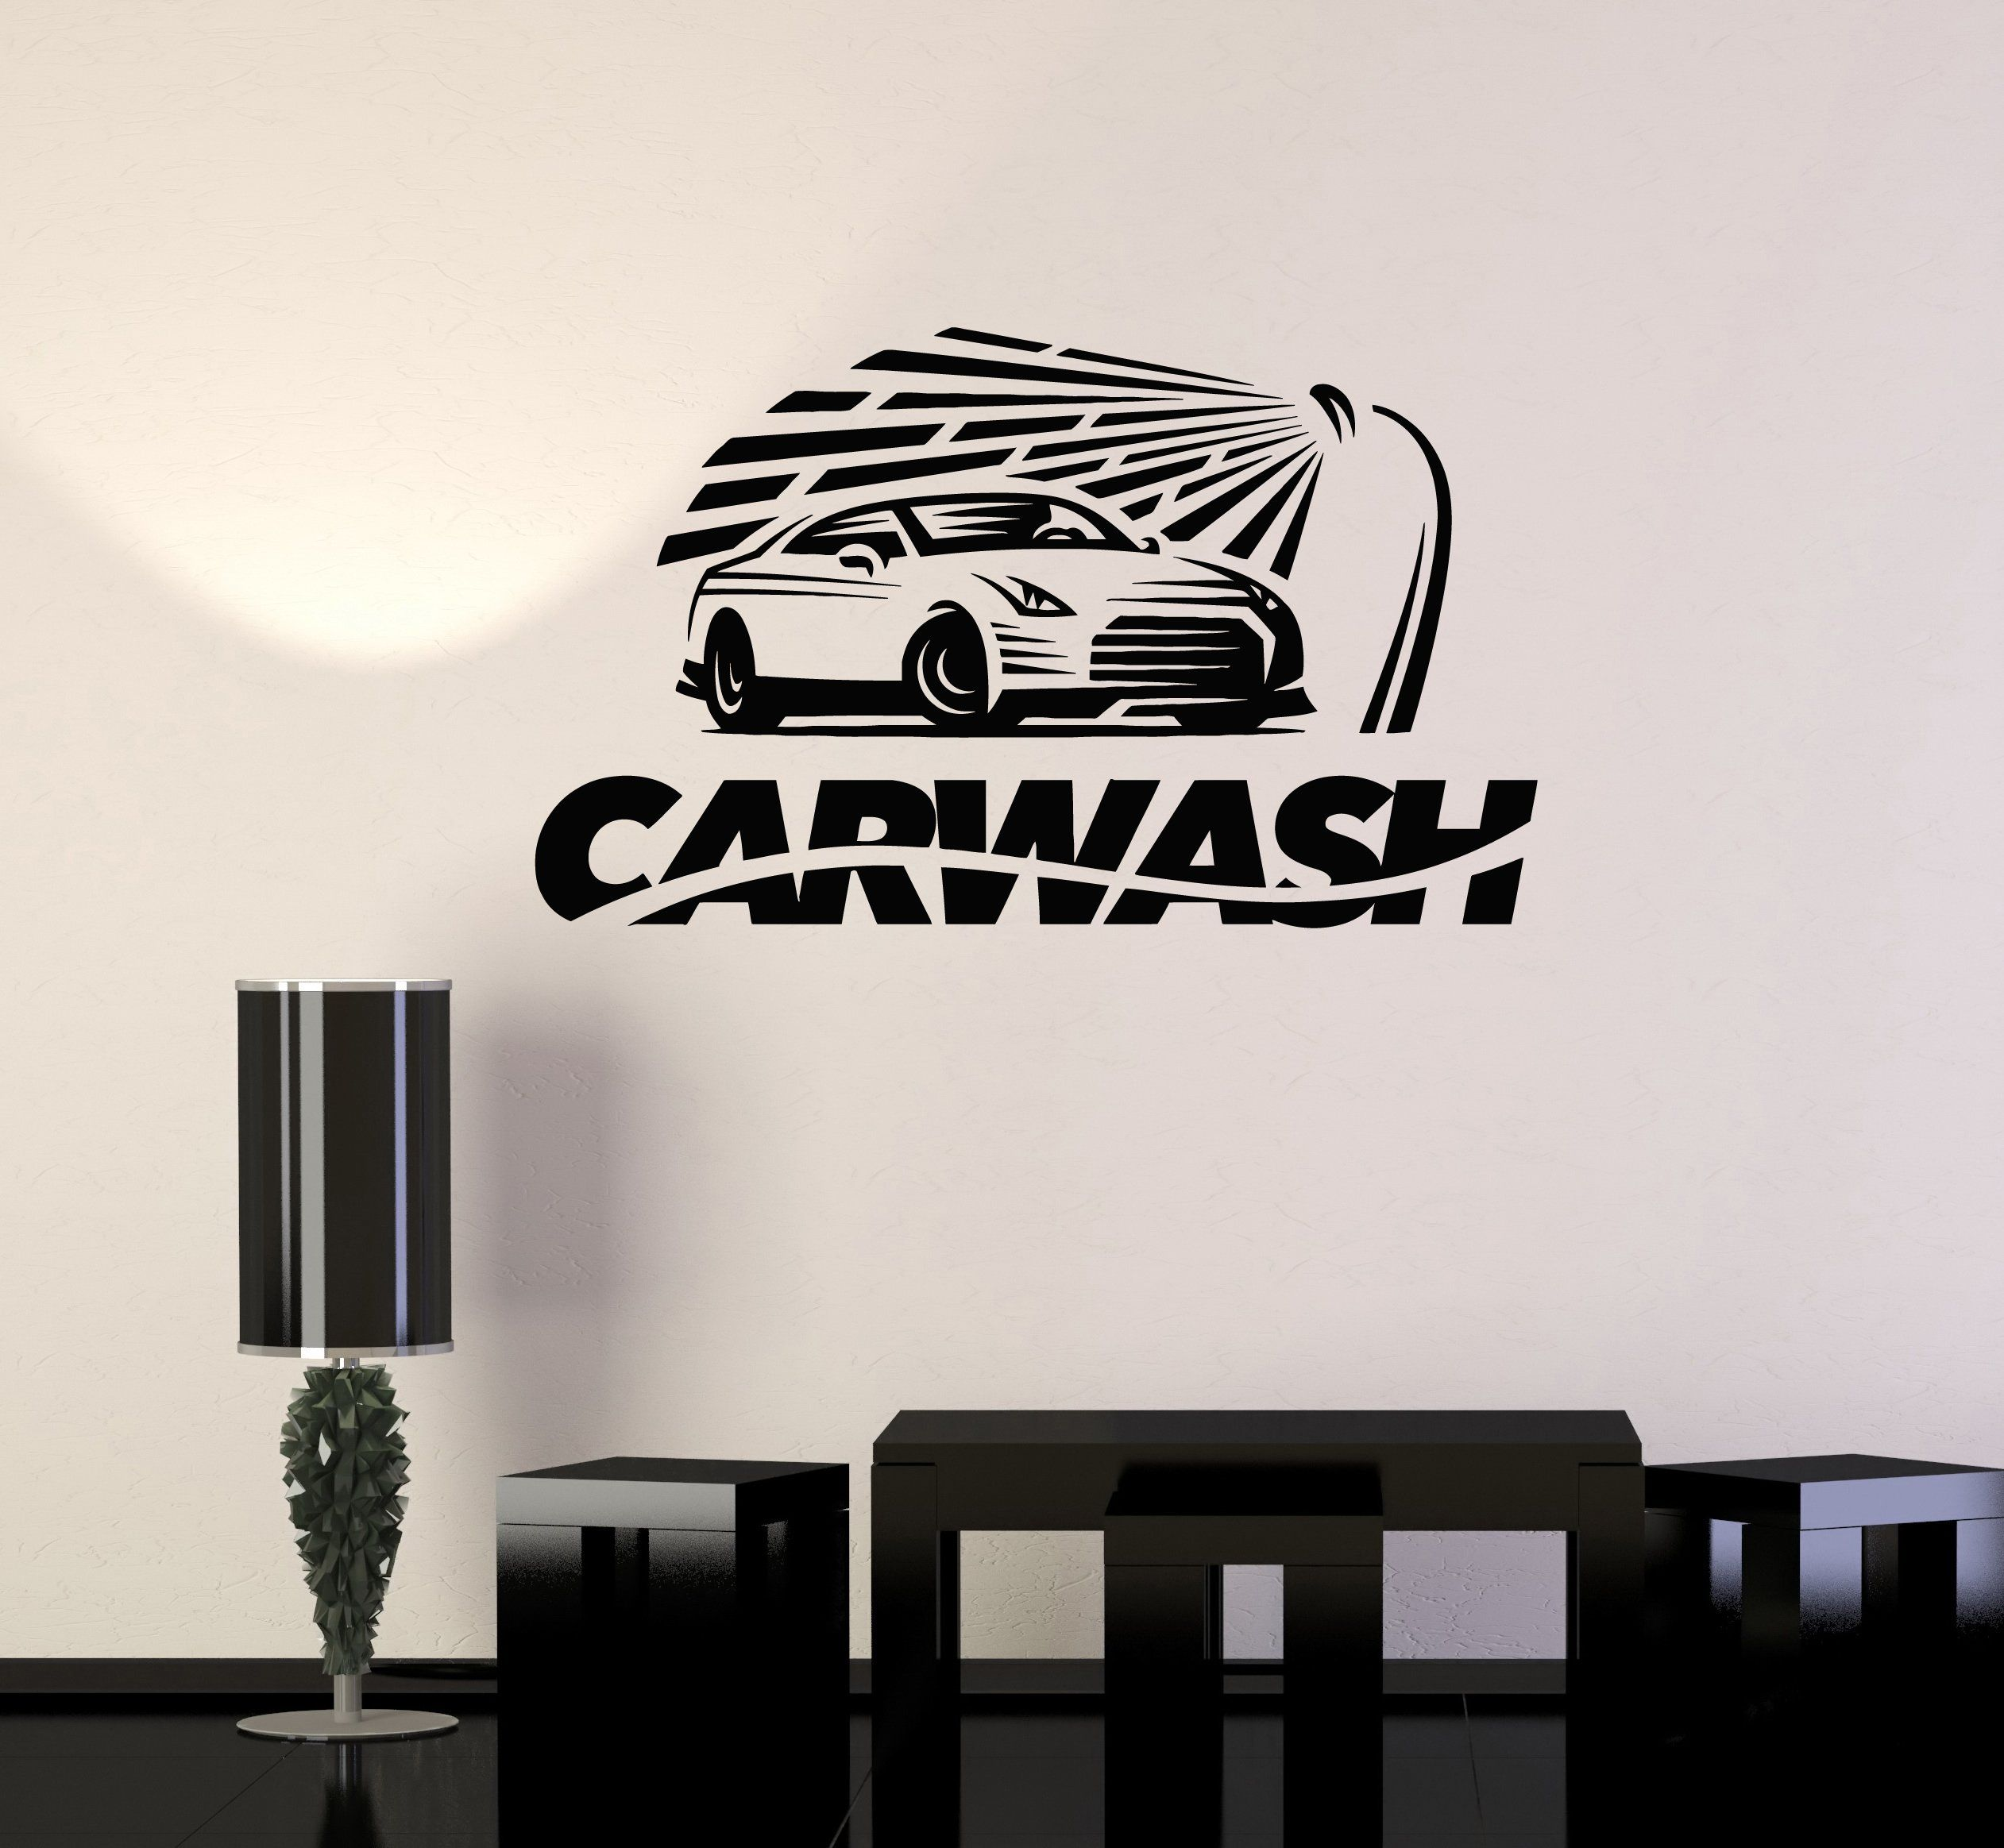 Vinyl Wall Decal Car Wash Auto Garage Service Stickers Mural Ig5313 Vinyl Wall Decals Vinyl Wall Car Wash [ 2327 x 2523 Pixel ]